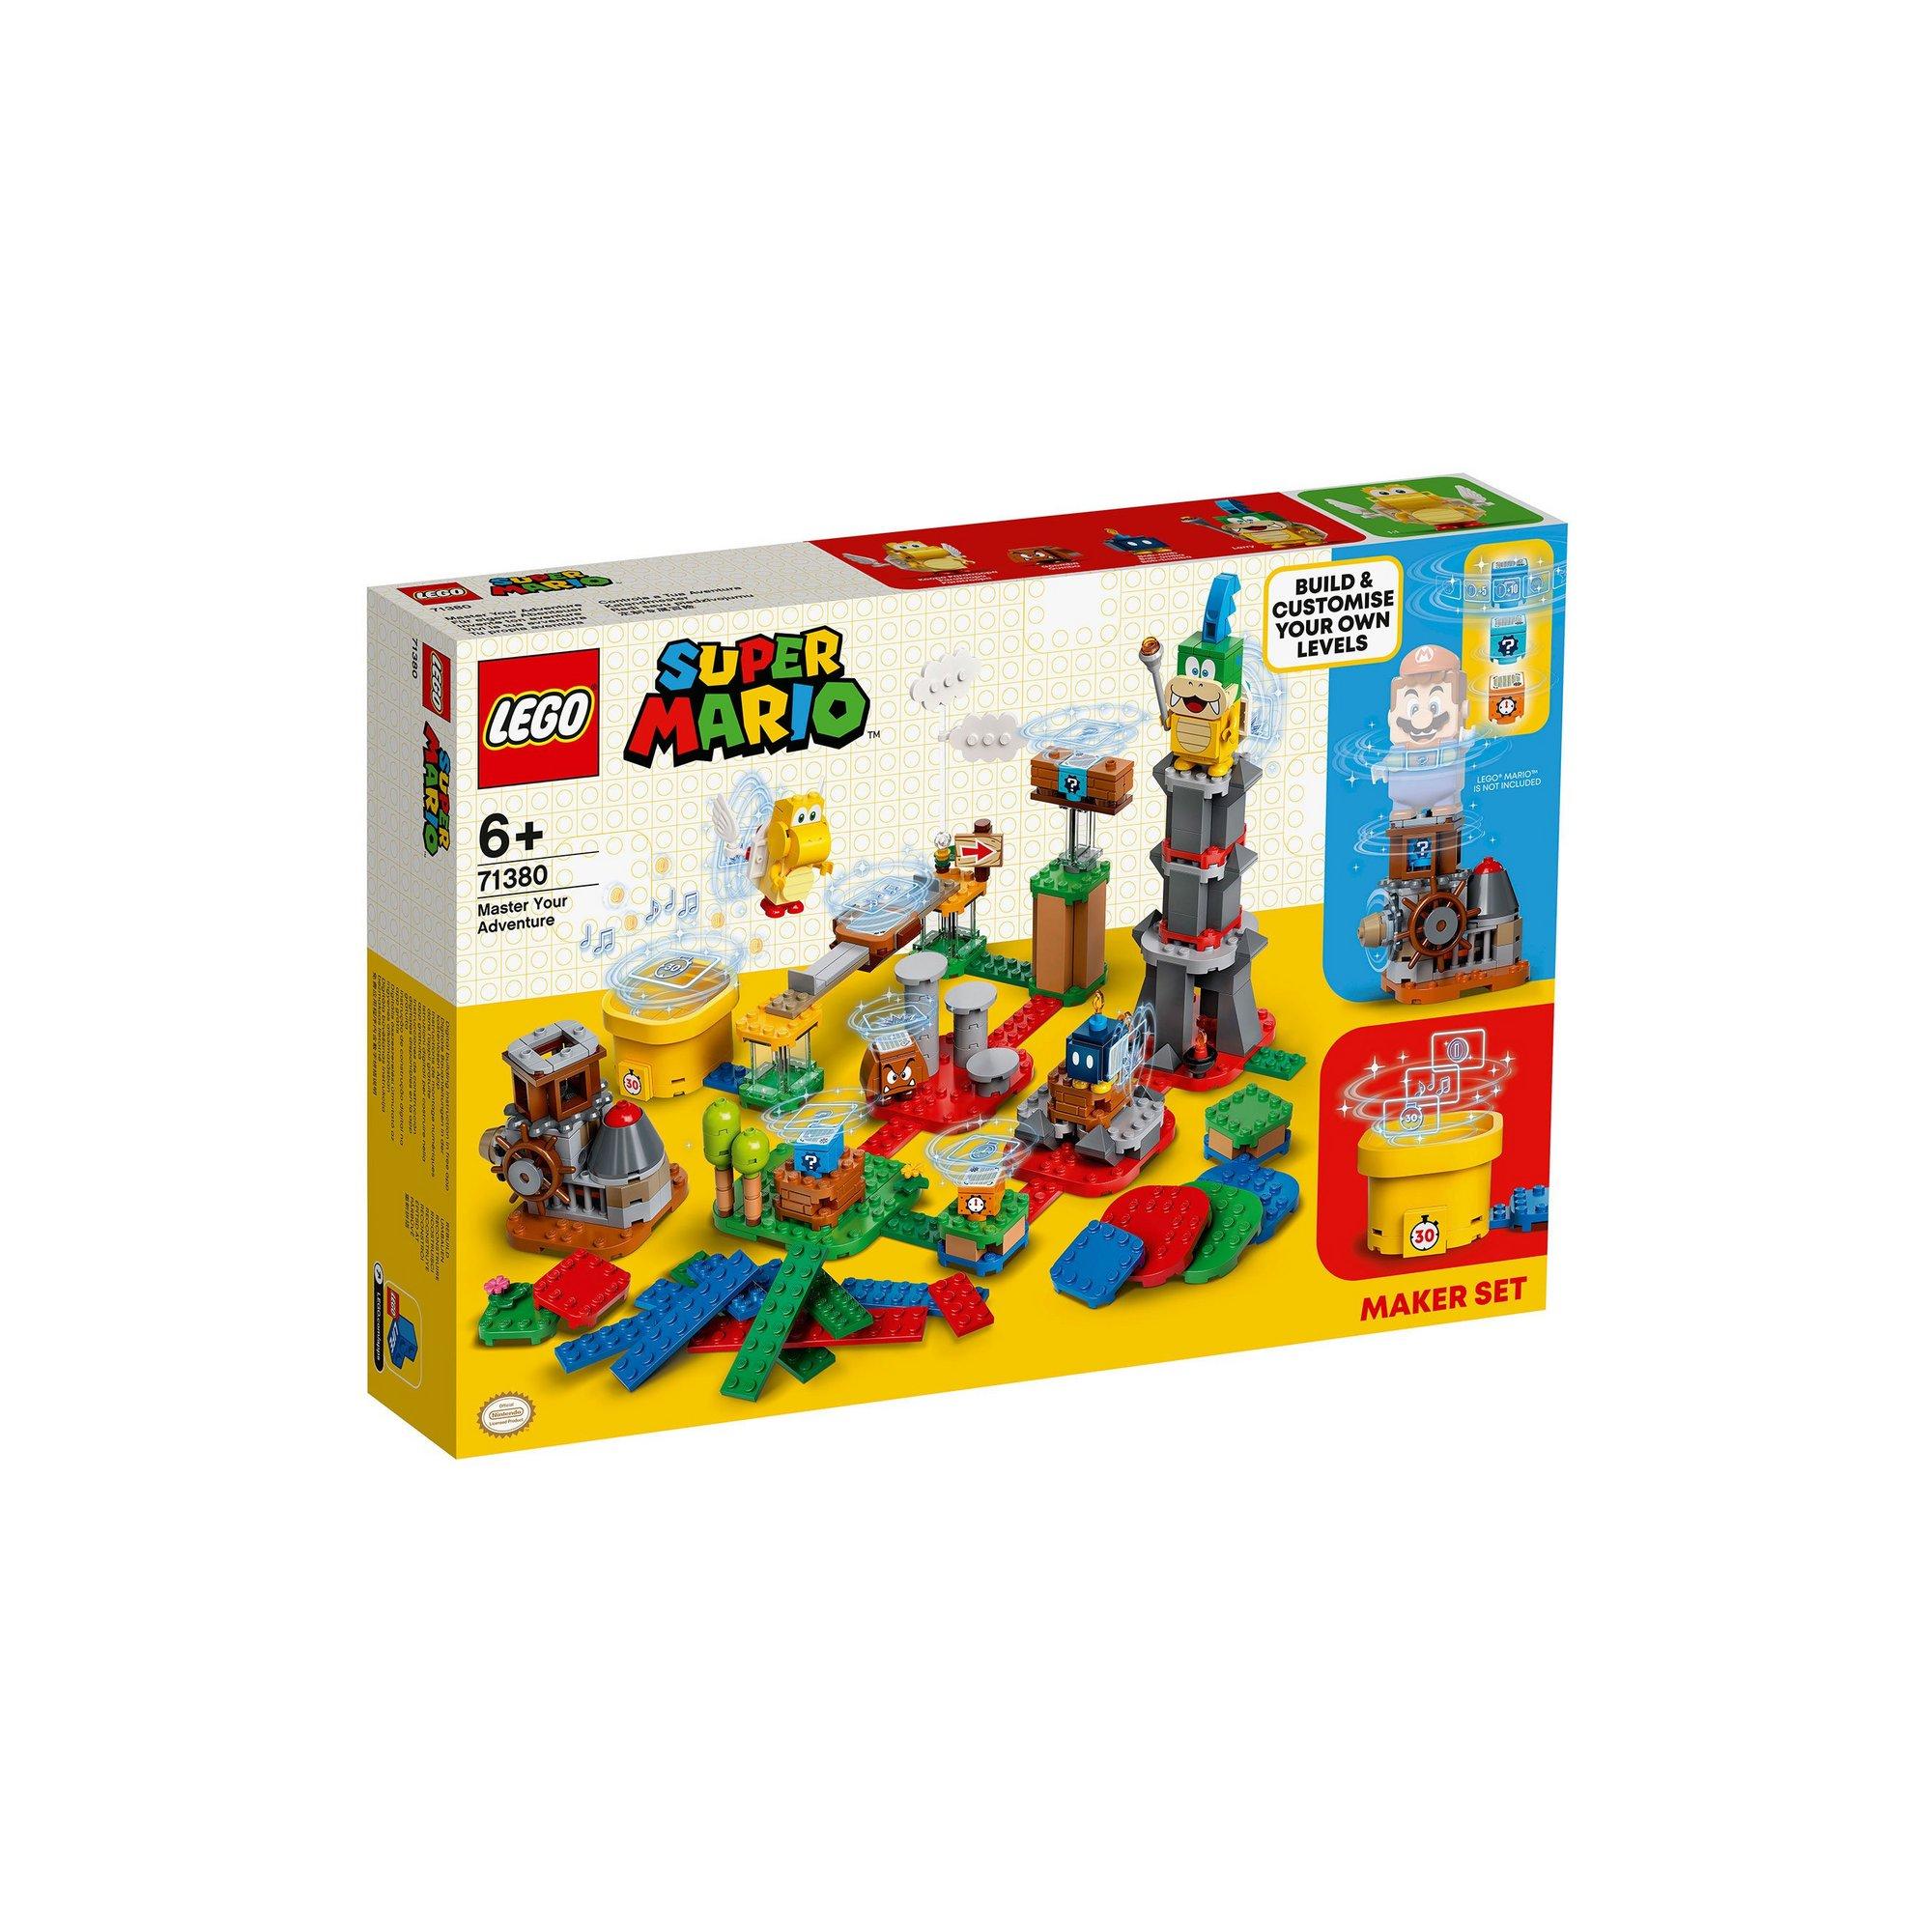 Image of LEGO Super Mario Master Your Adventure Maker